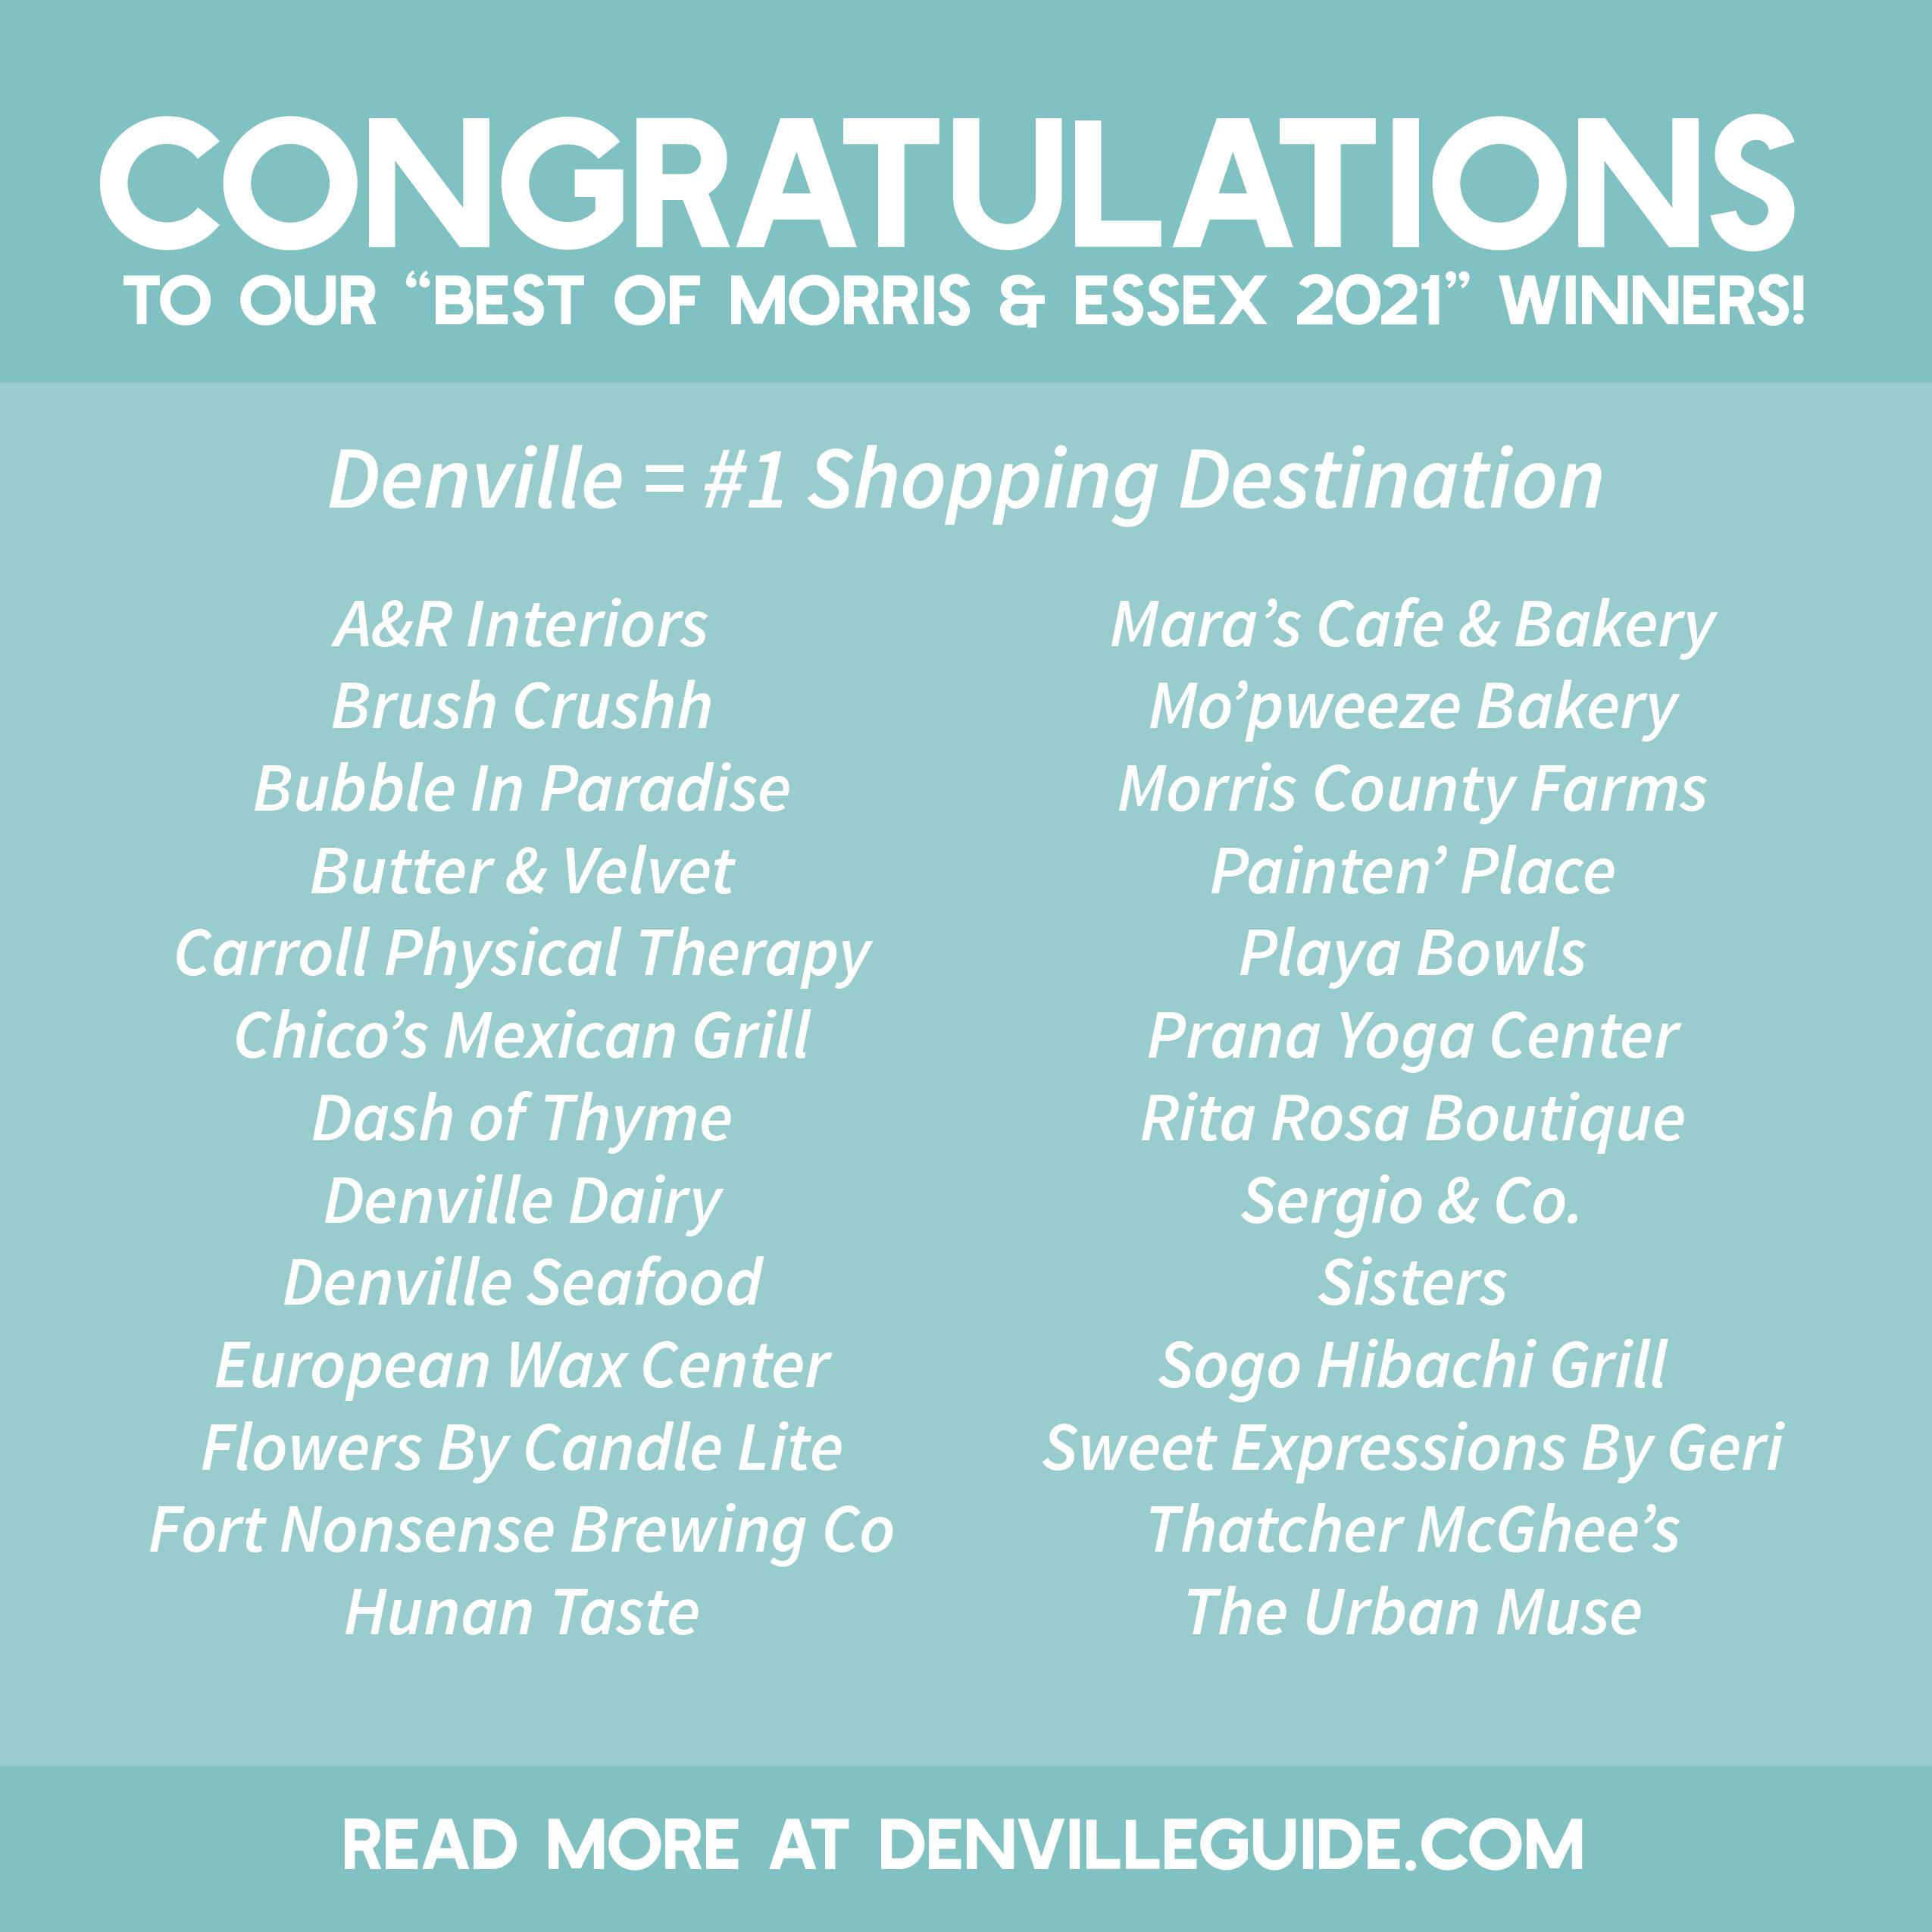 Best of Morris & Essex 2021 Winners in Denville - DenvilleGuide.com